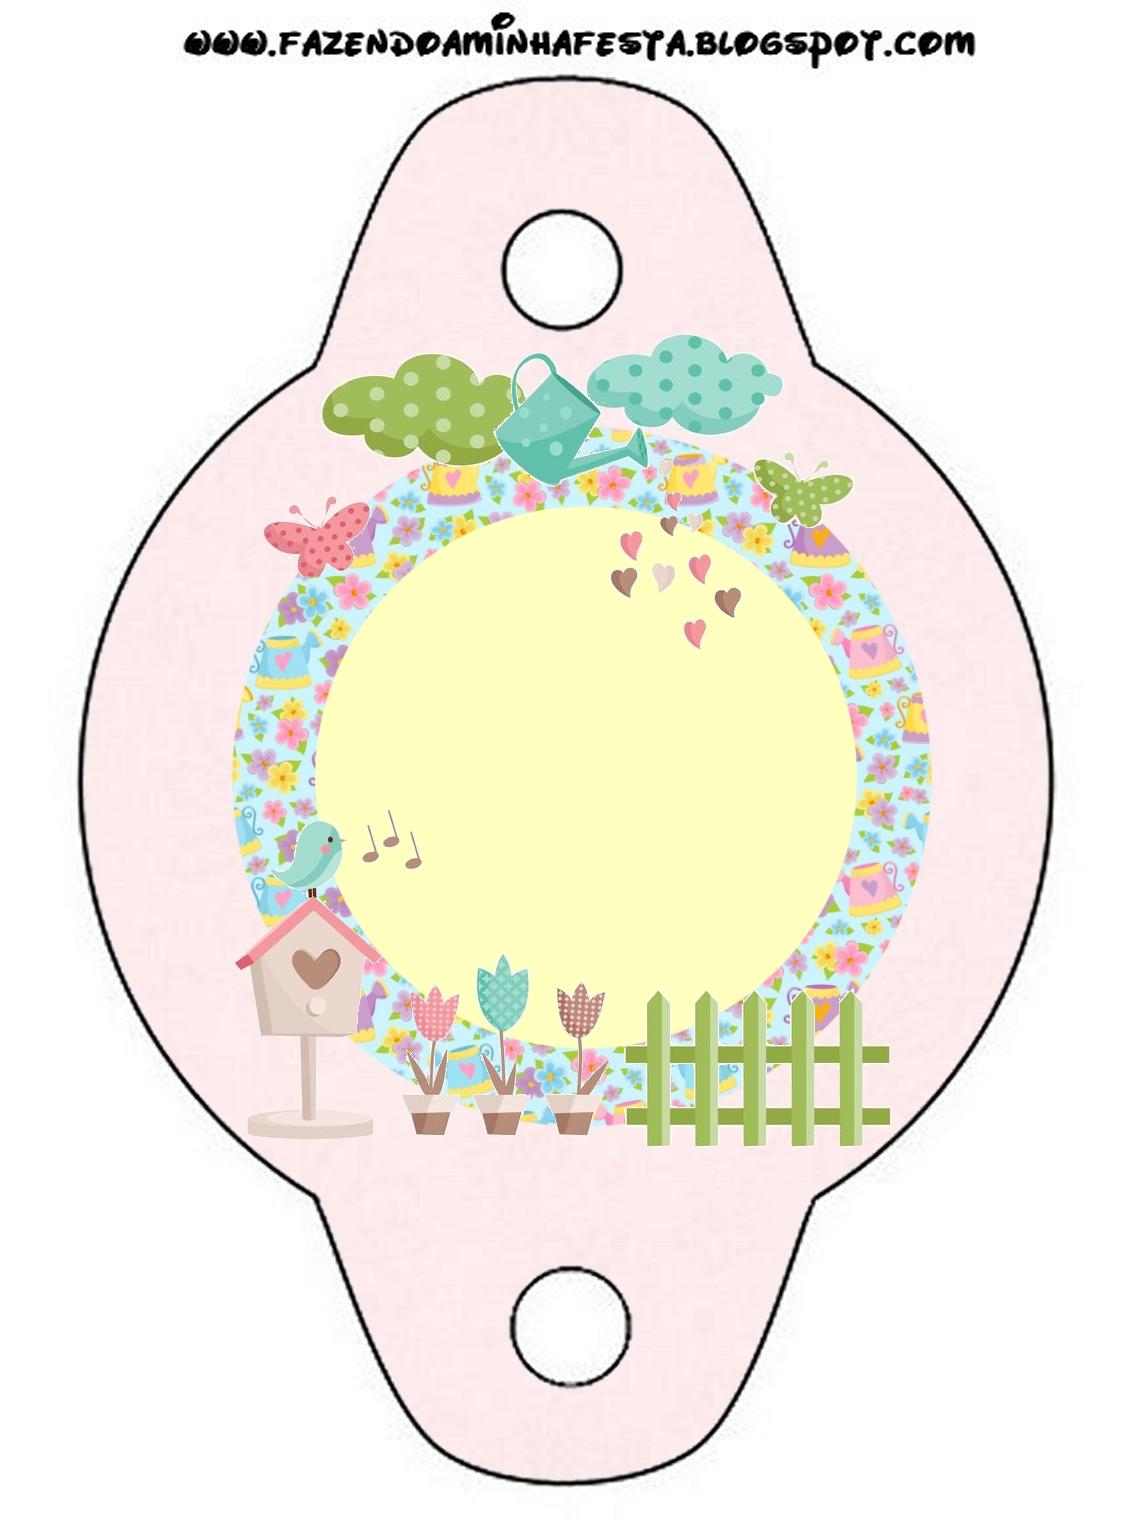 rotulos festa jardim encantado:Kit de festa Personalizado com tema Jardim Encantado – Dicas pra